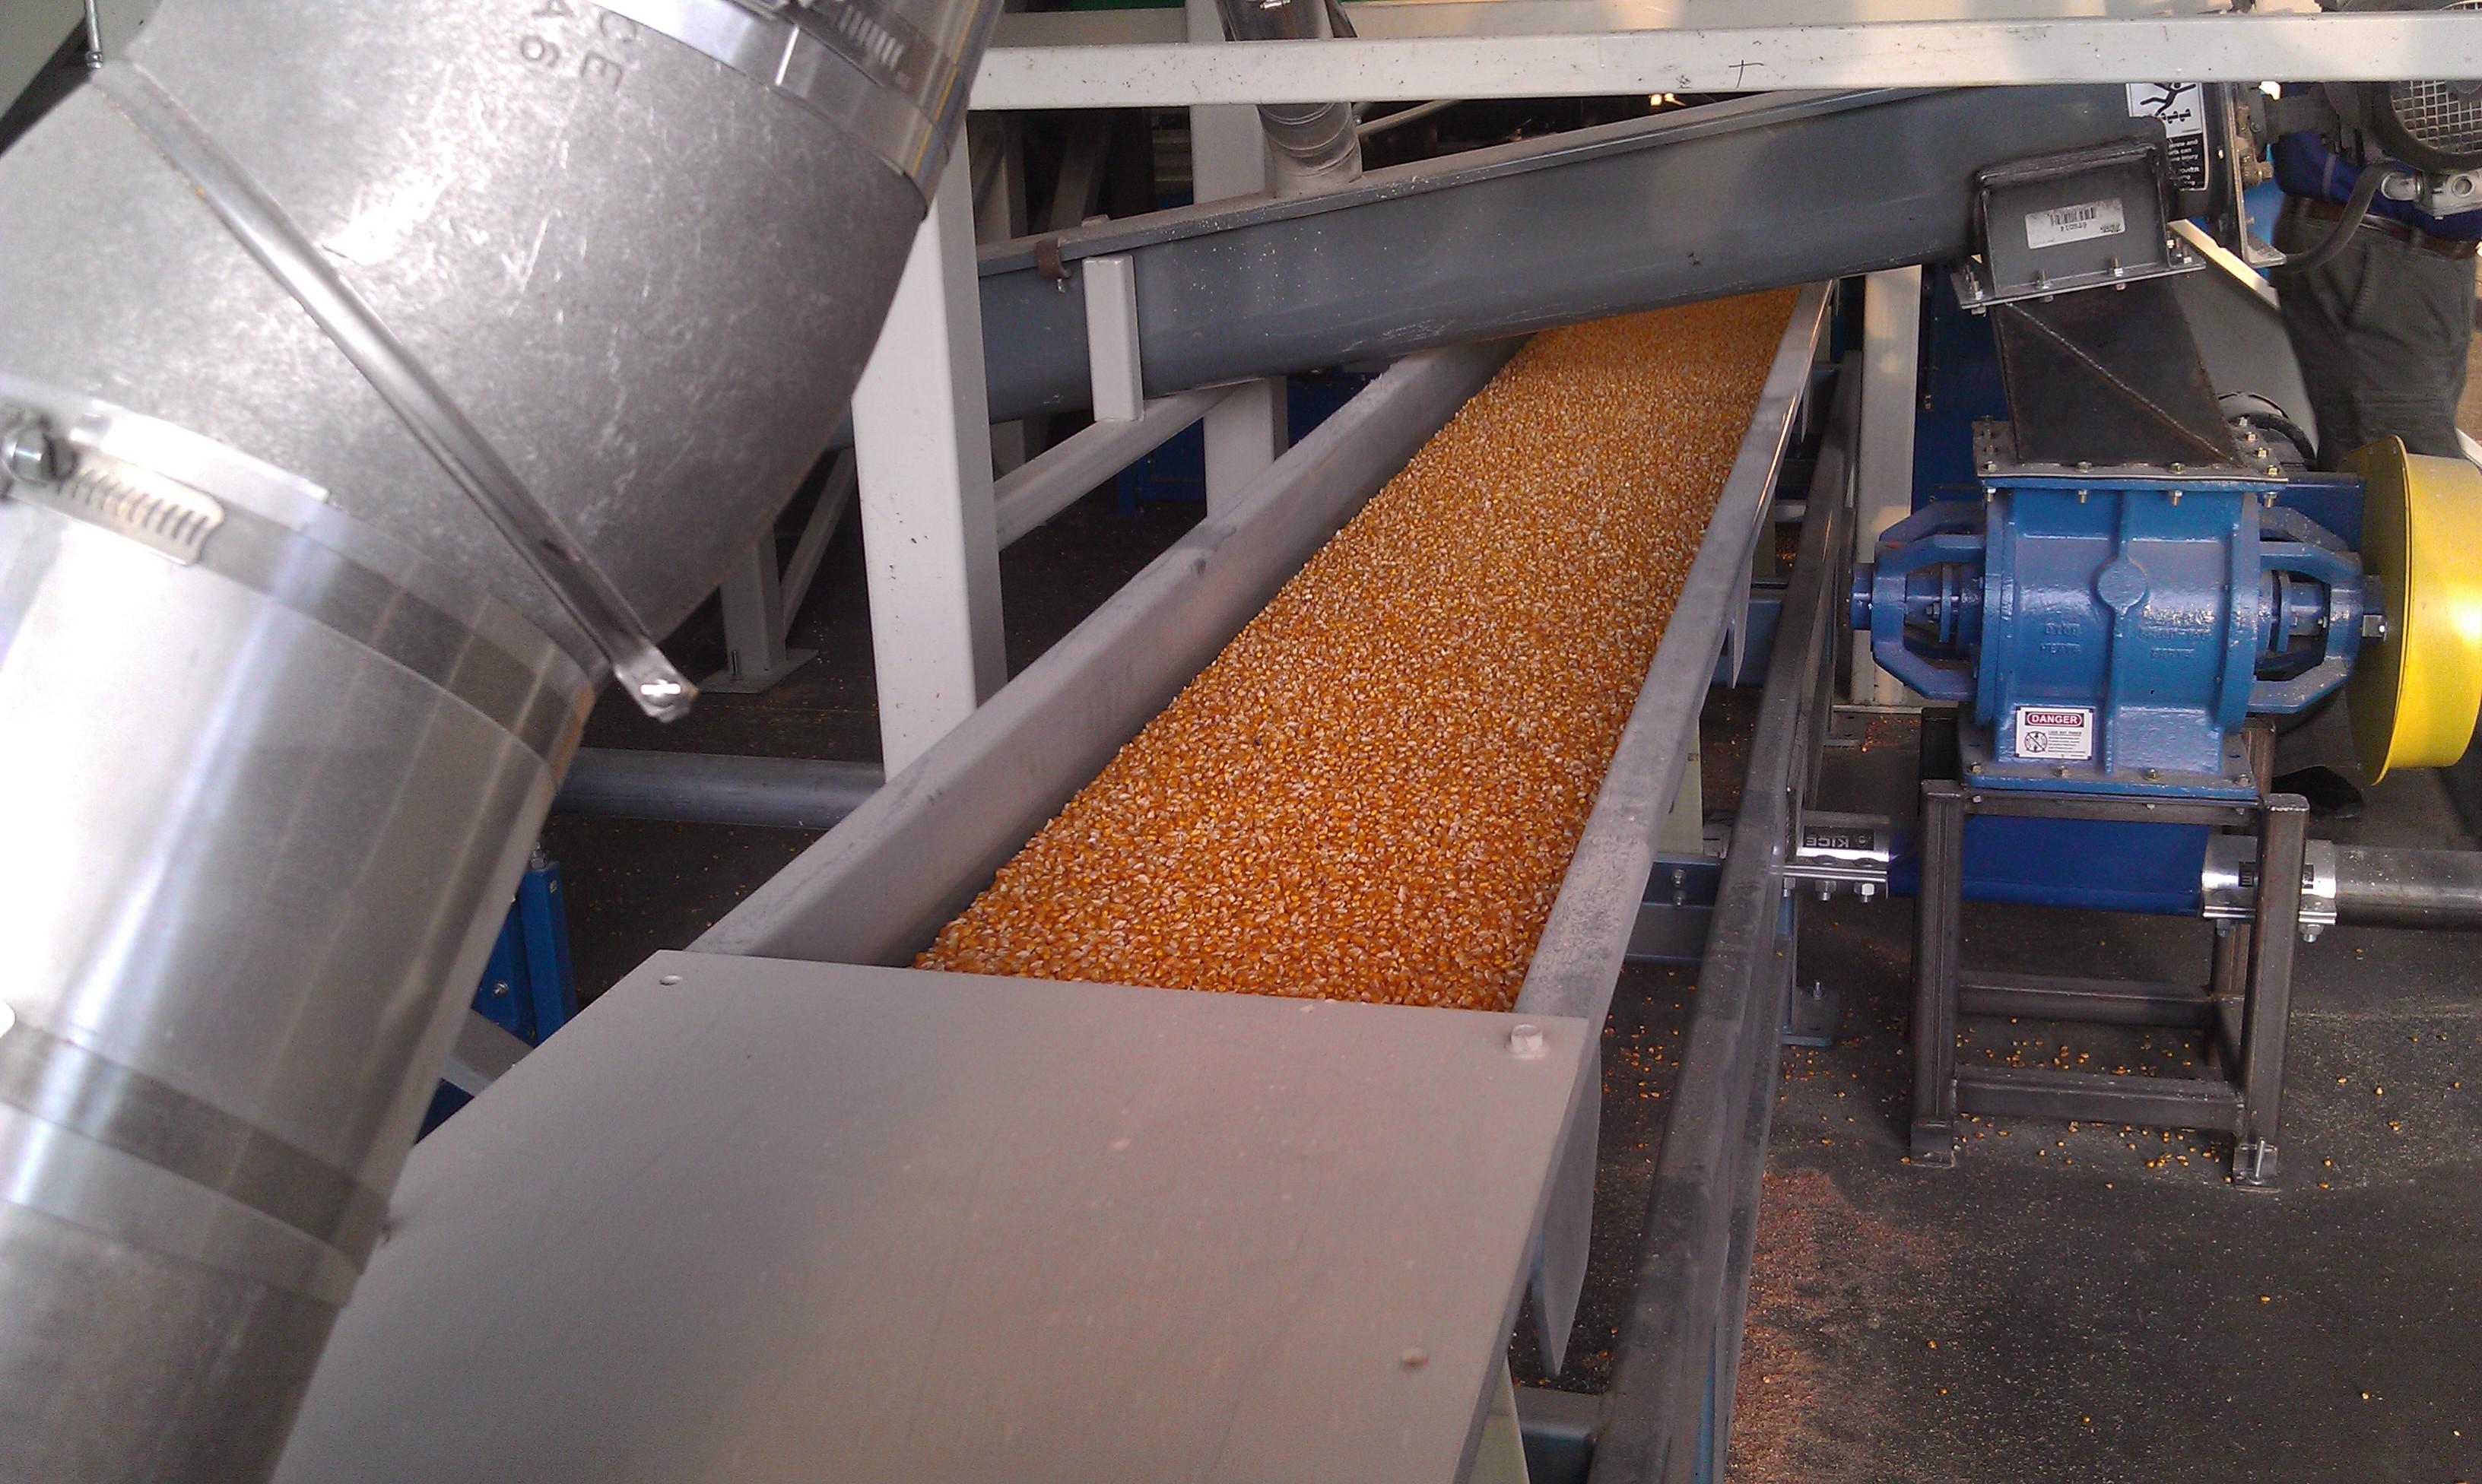 Seed on Conveyor